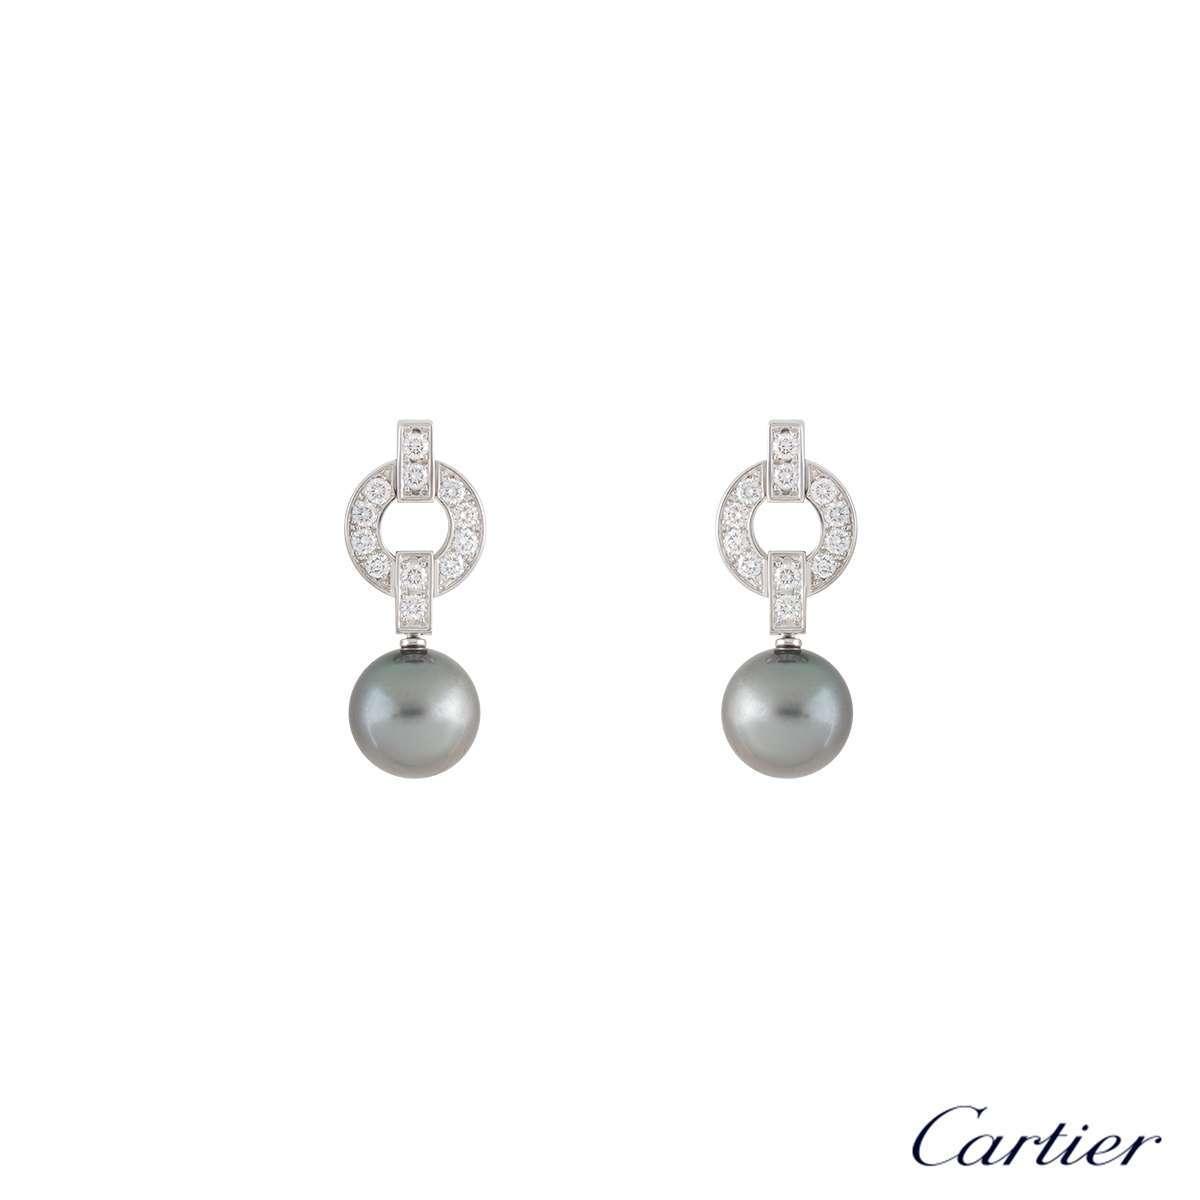 CartierHimaliaDiamond & Pearl EarringsB8039500